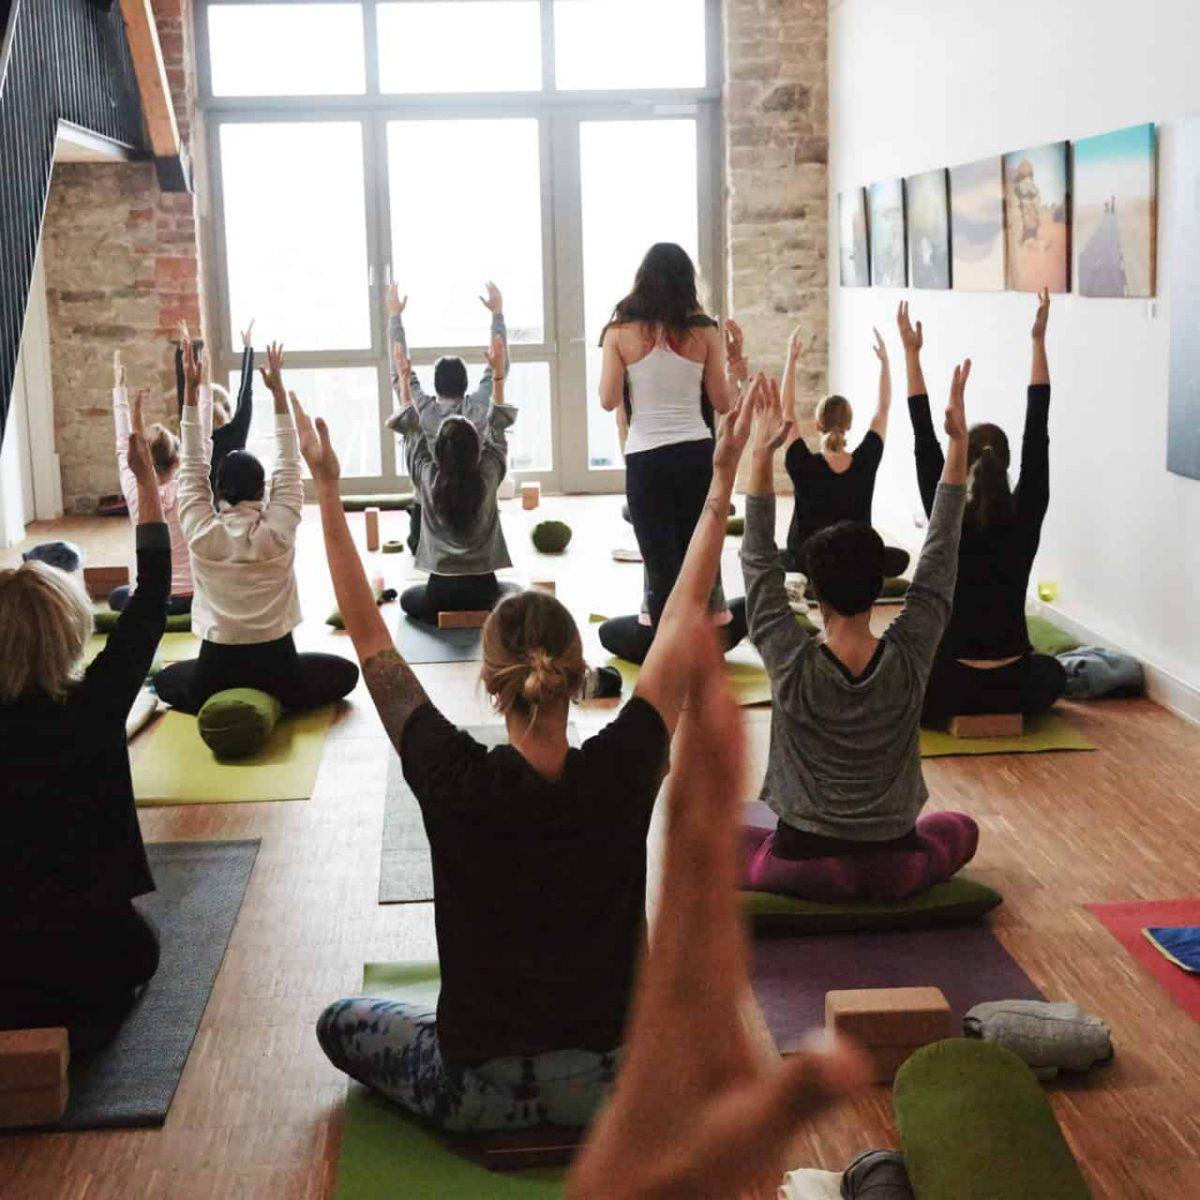 YogaManufaktur_Wuerzburg_Buergerbraeugelaende_Aufwaermen_Strecken_Arme_nach_oben